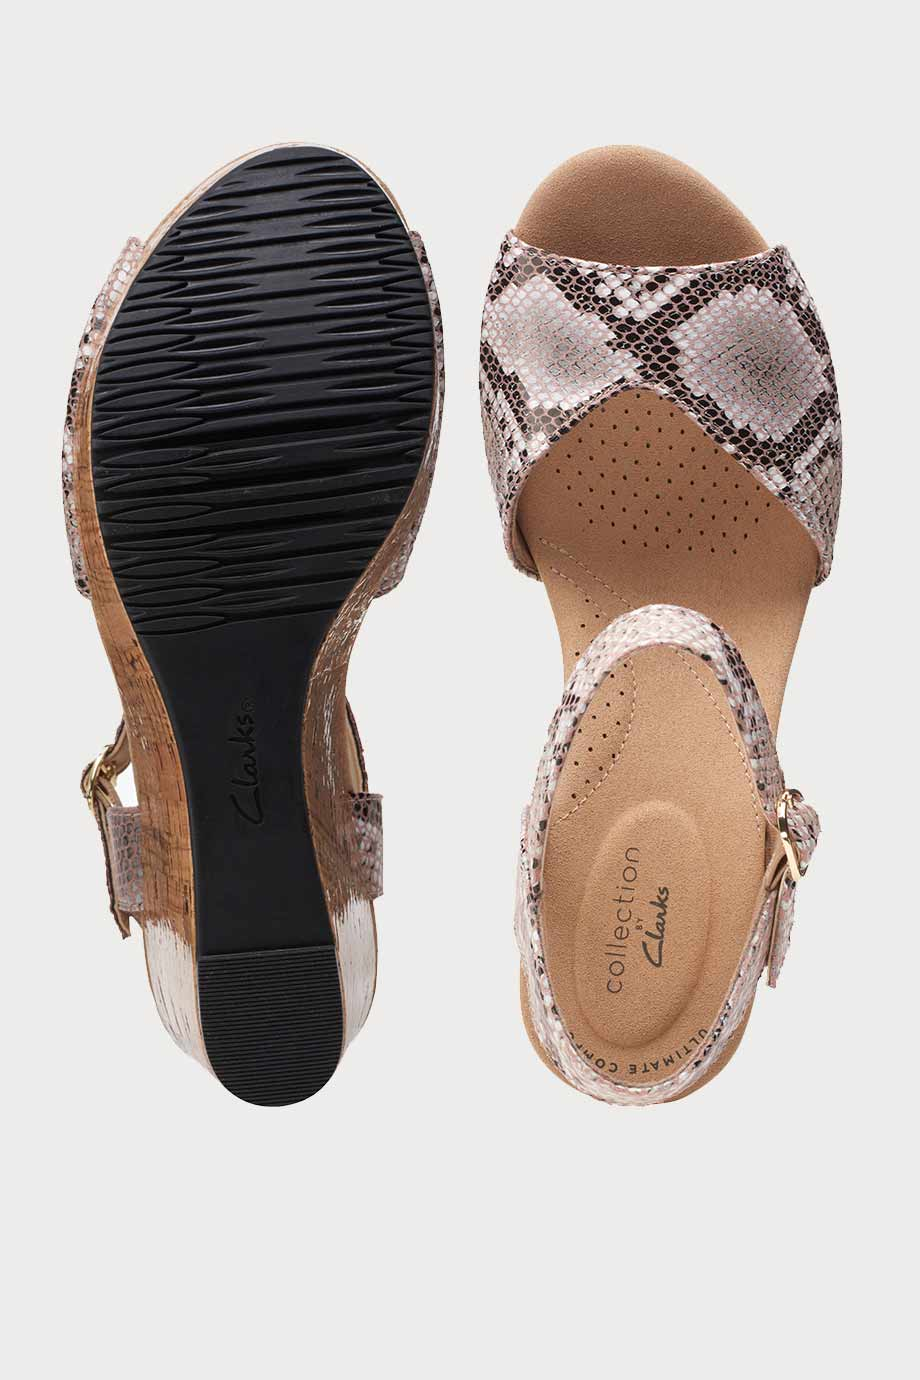 spiridoula metheniti shoes xalkida Annadel Mystic clarks natural snake 7